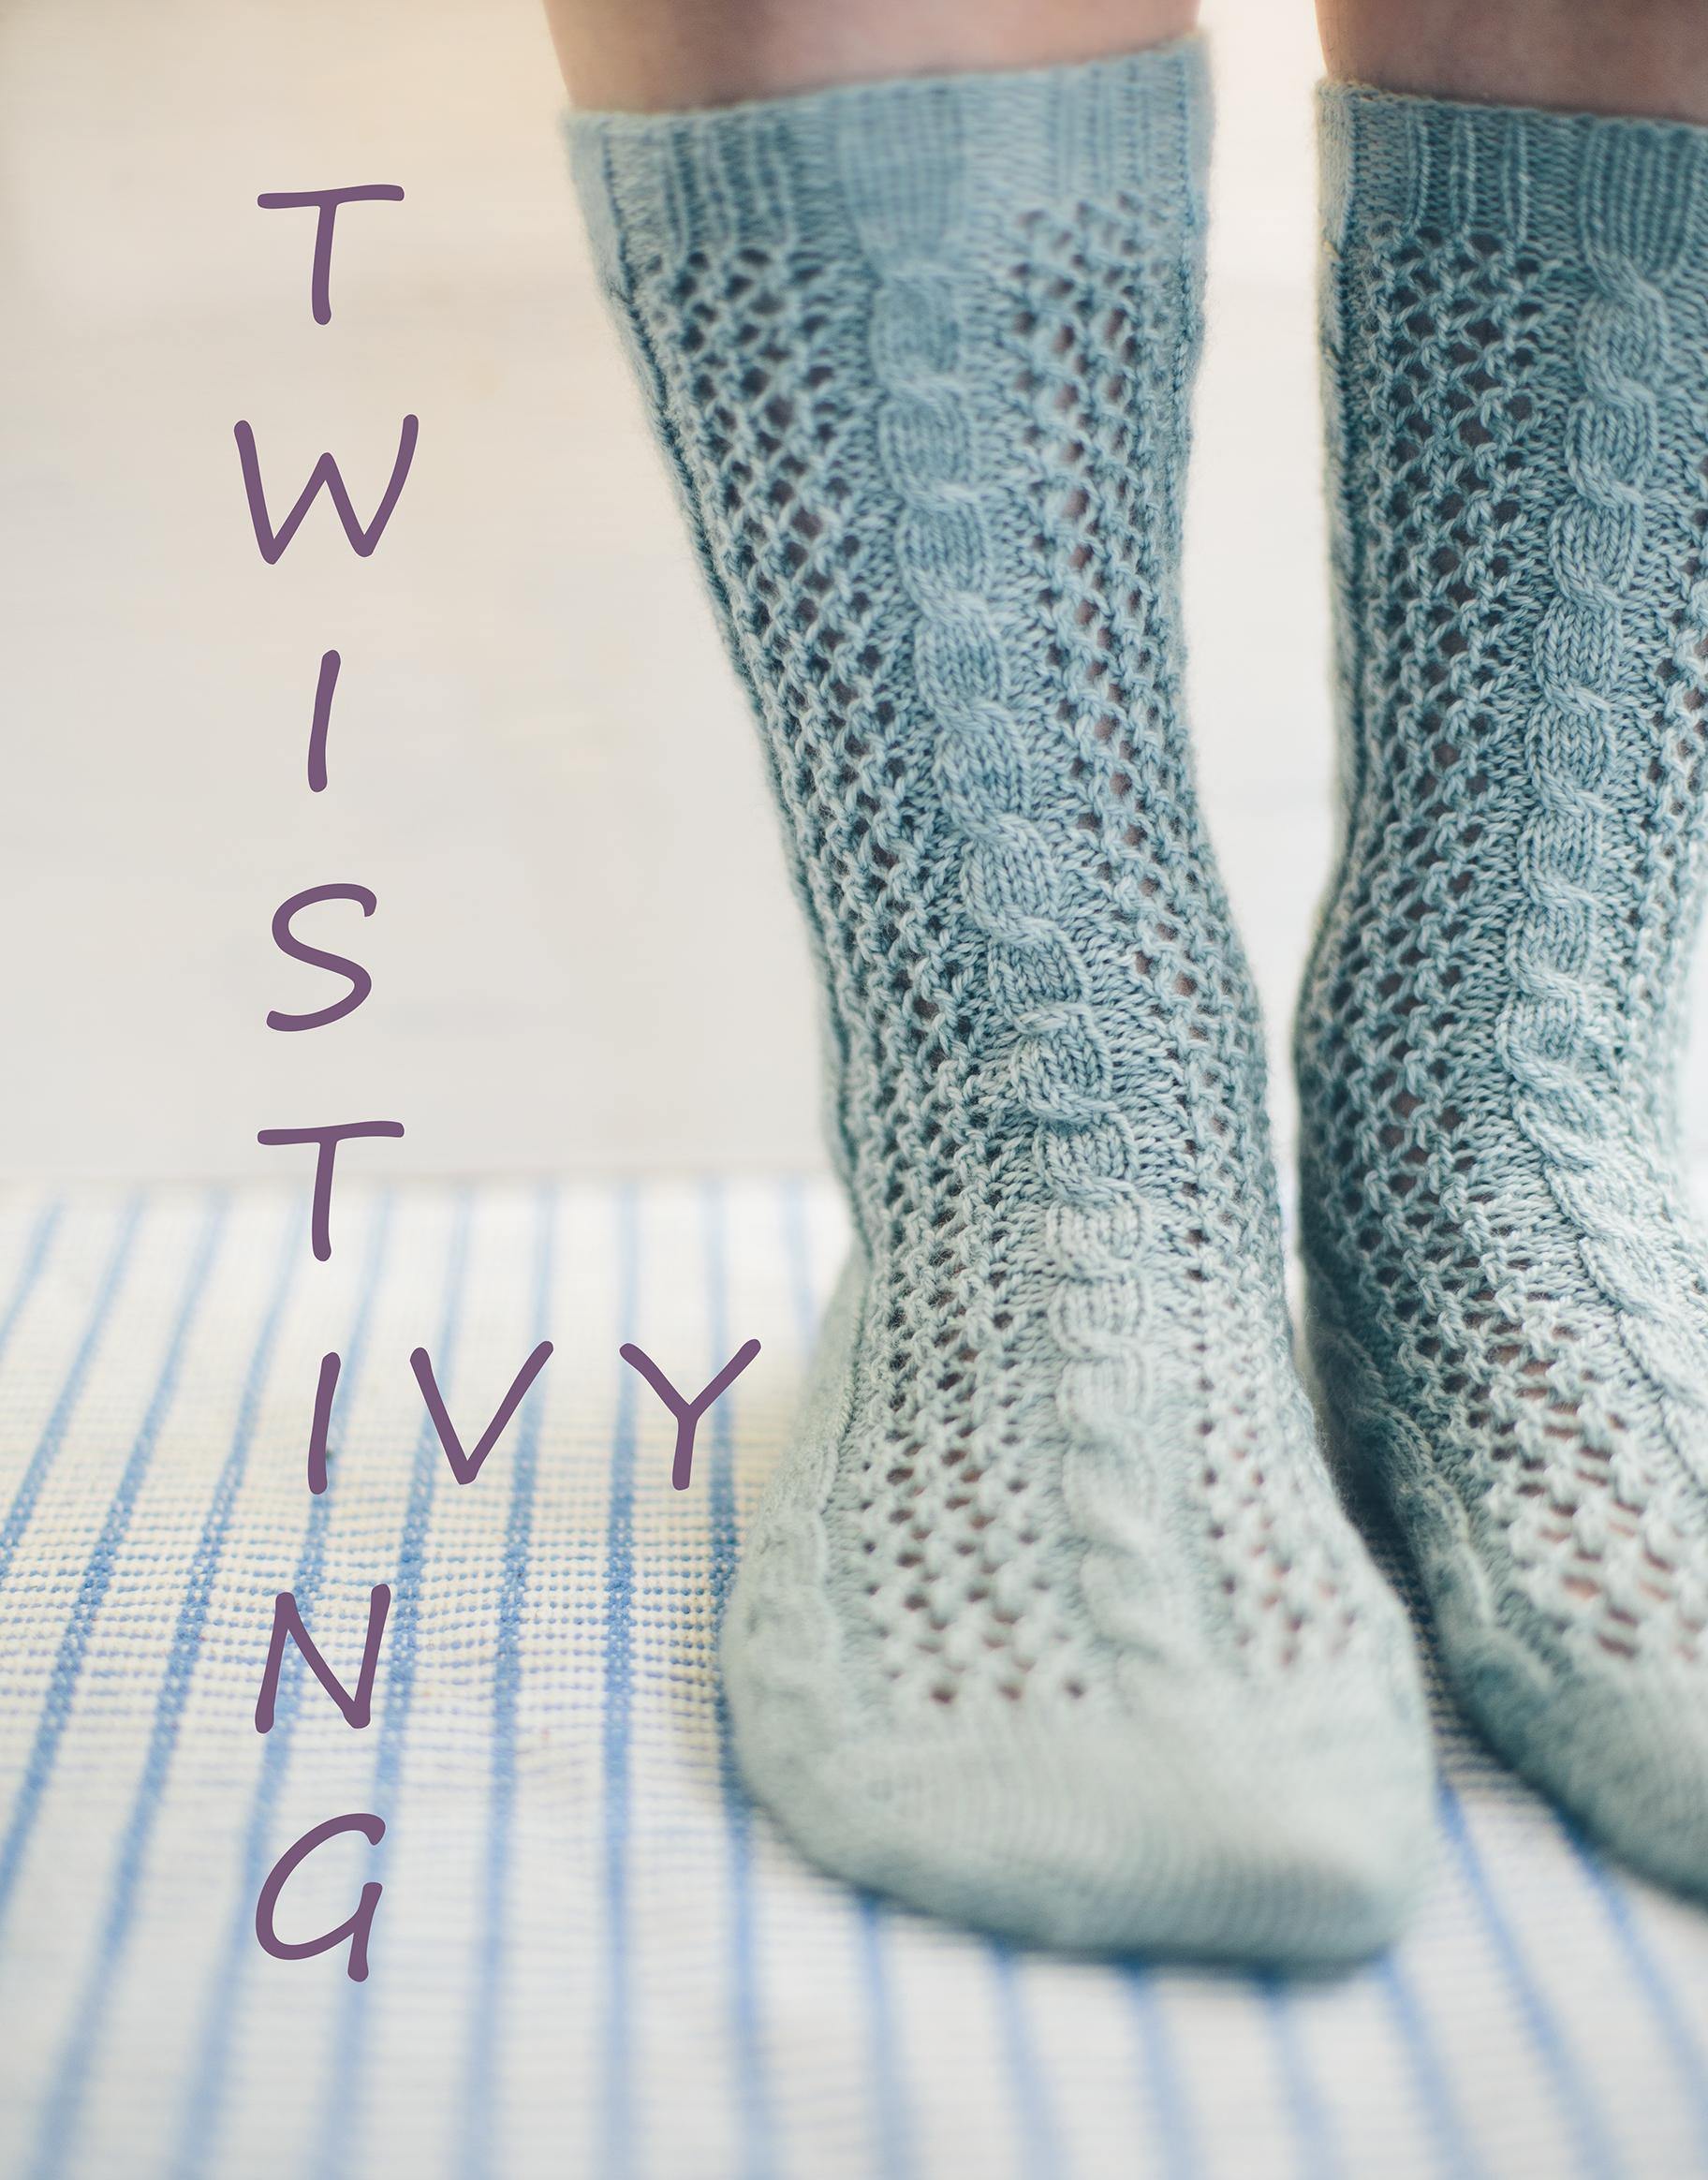 Twisting Ivy Socks, trailing their way to your needlesJane Burns ...